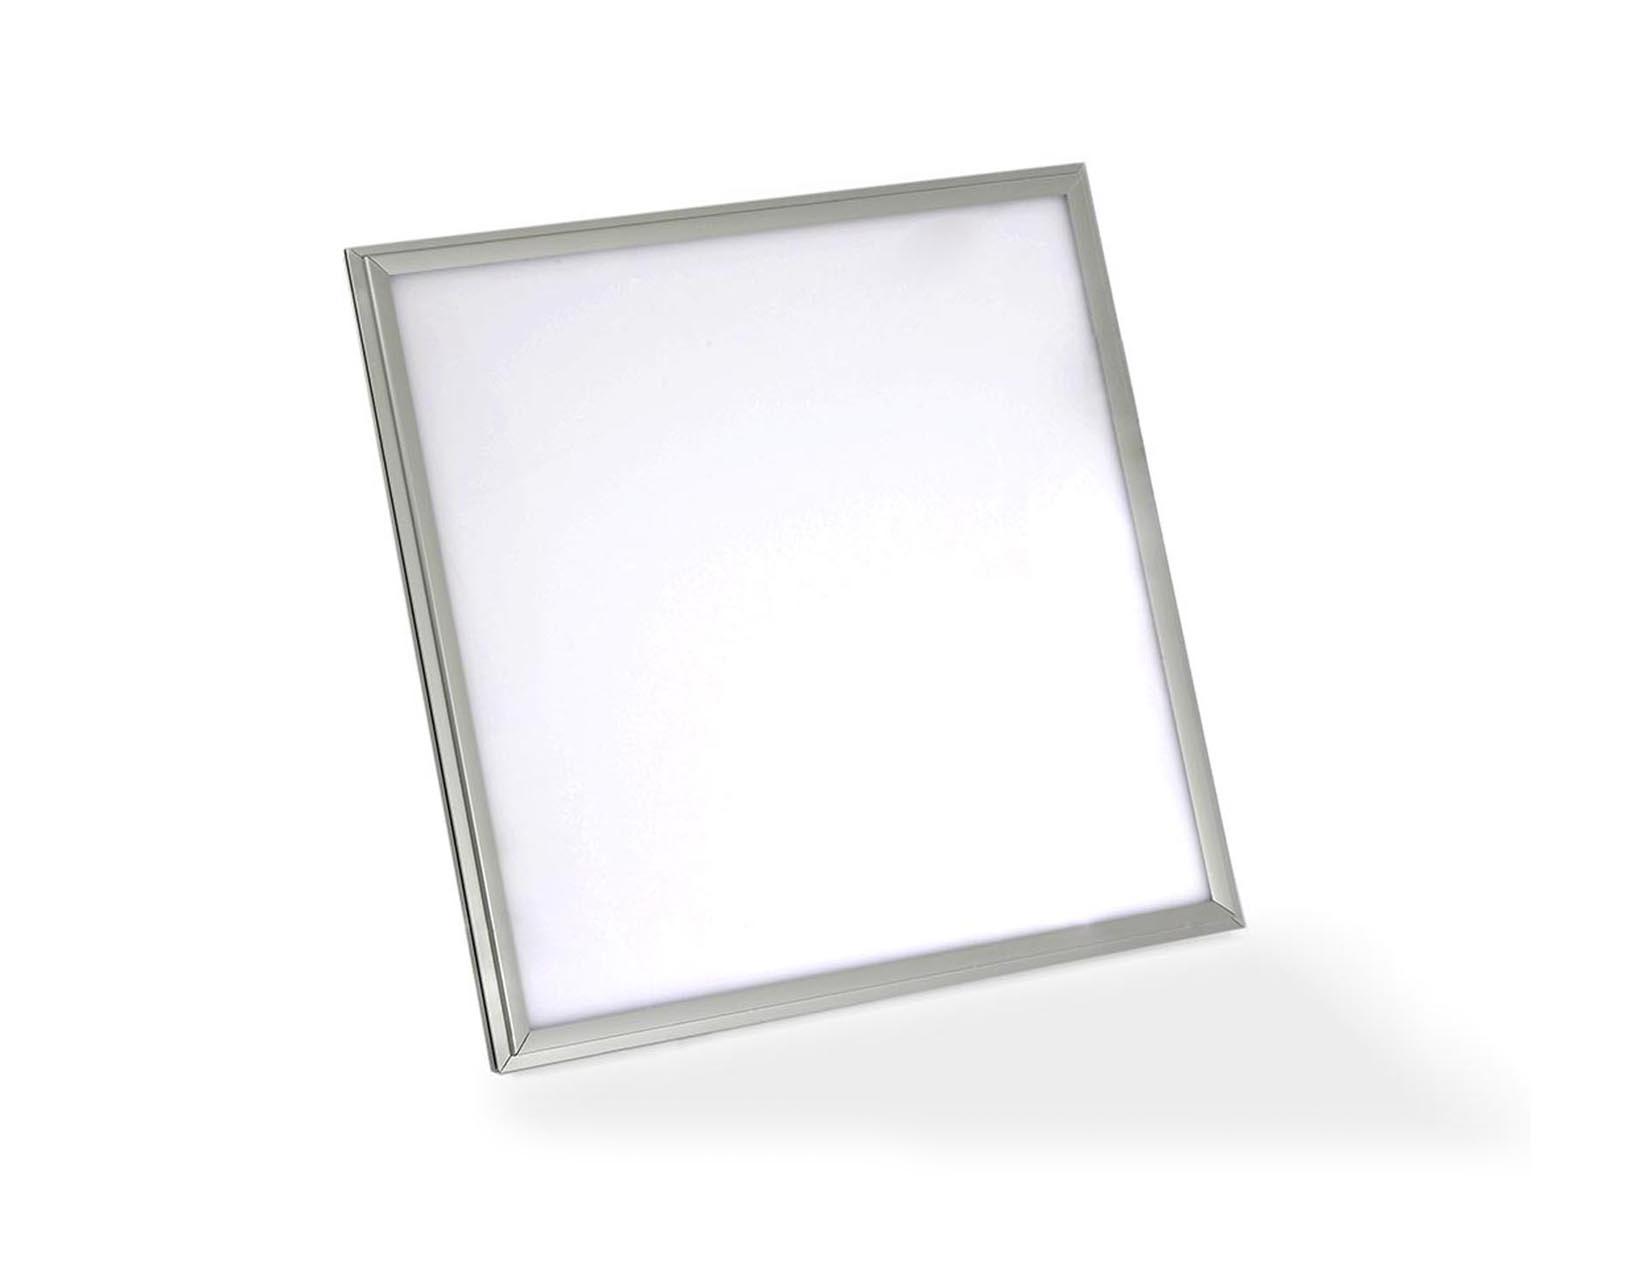 Iluminación - Led - ICARO - Garviled